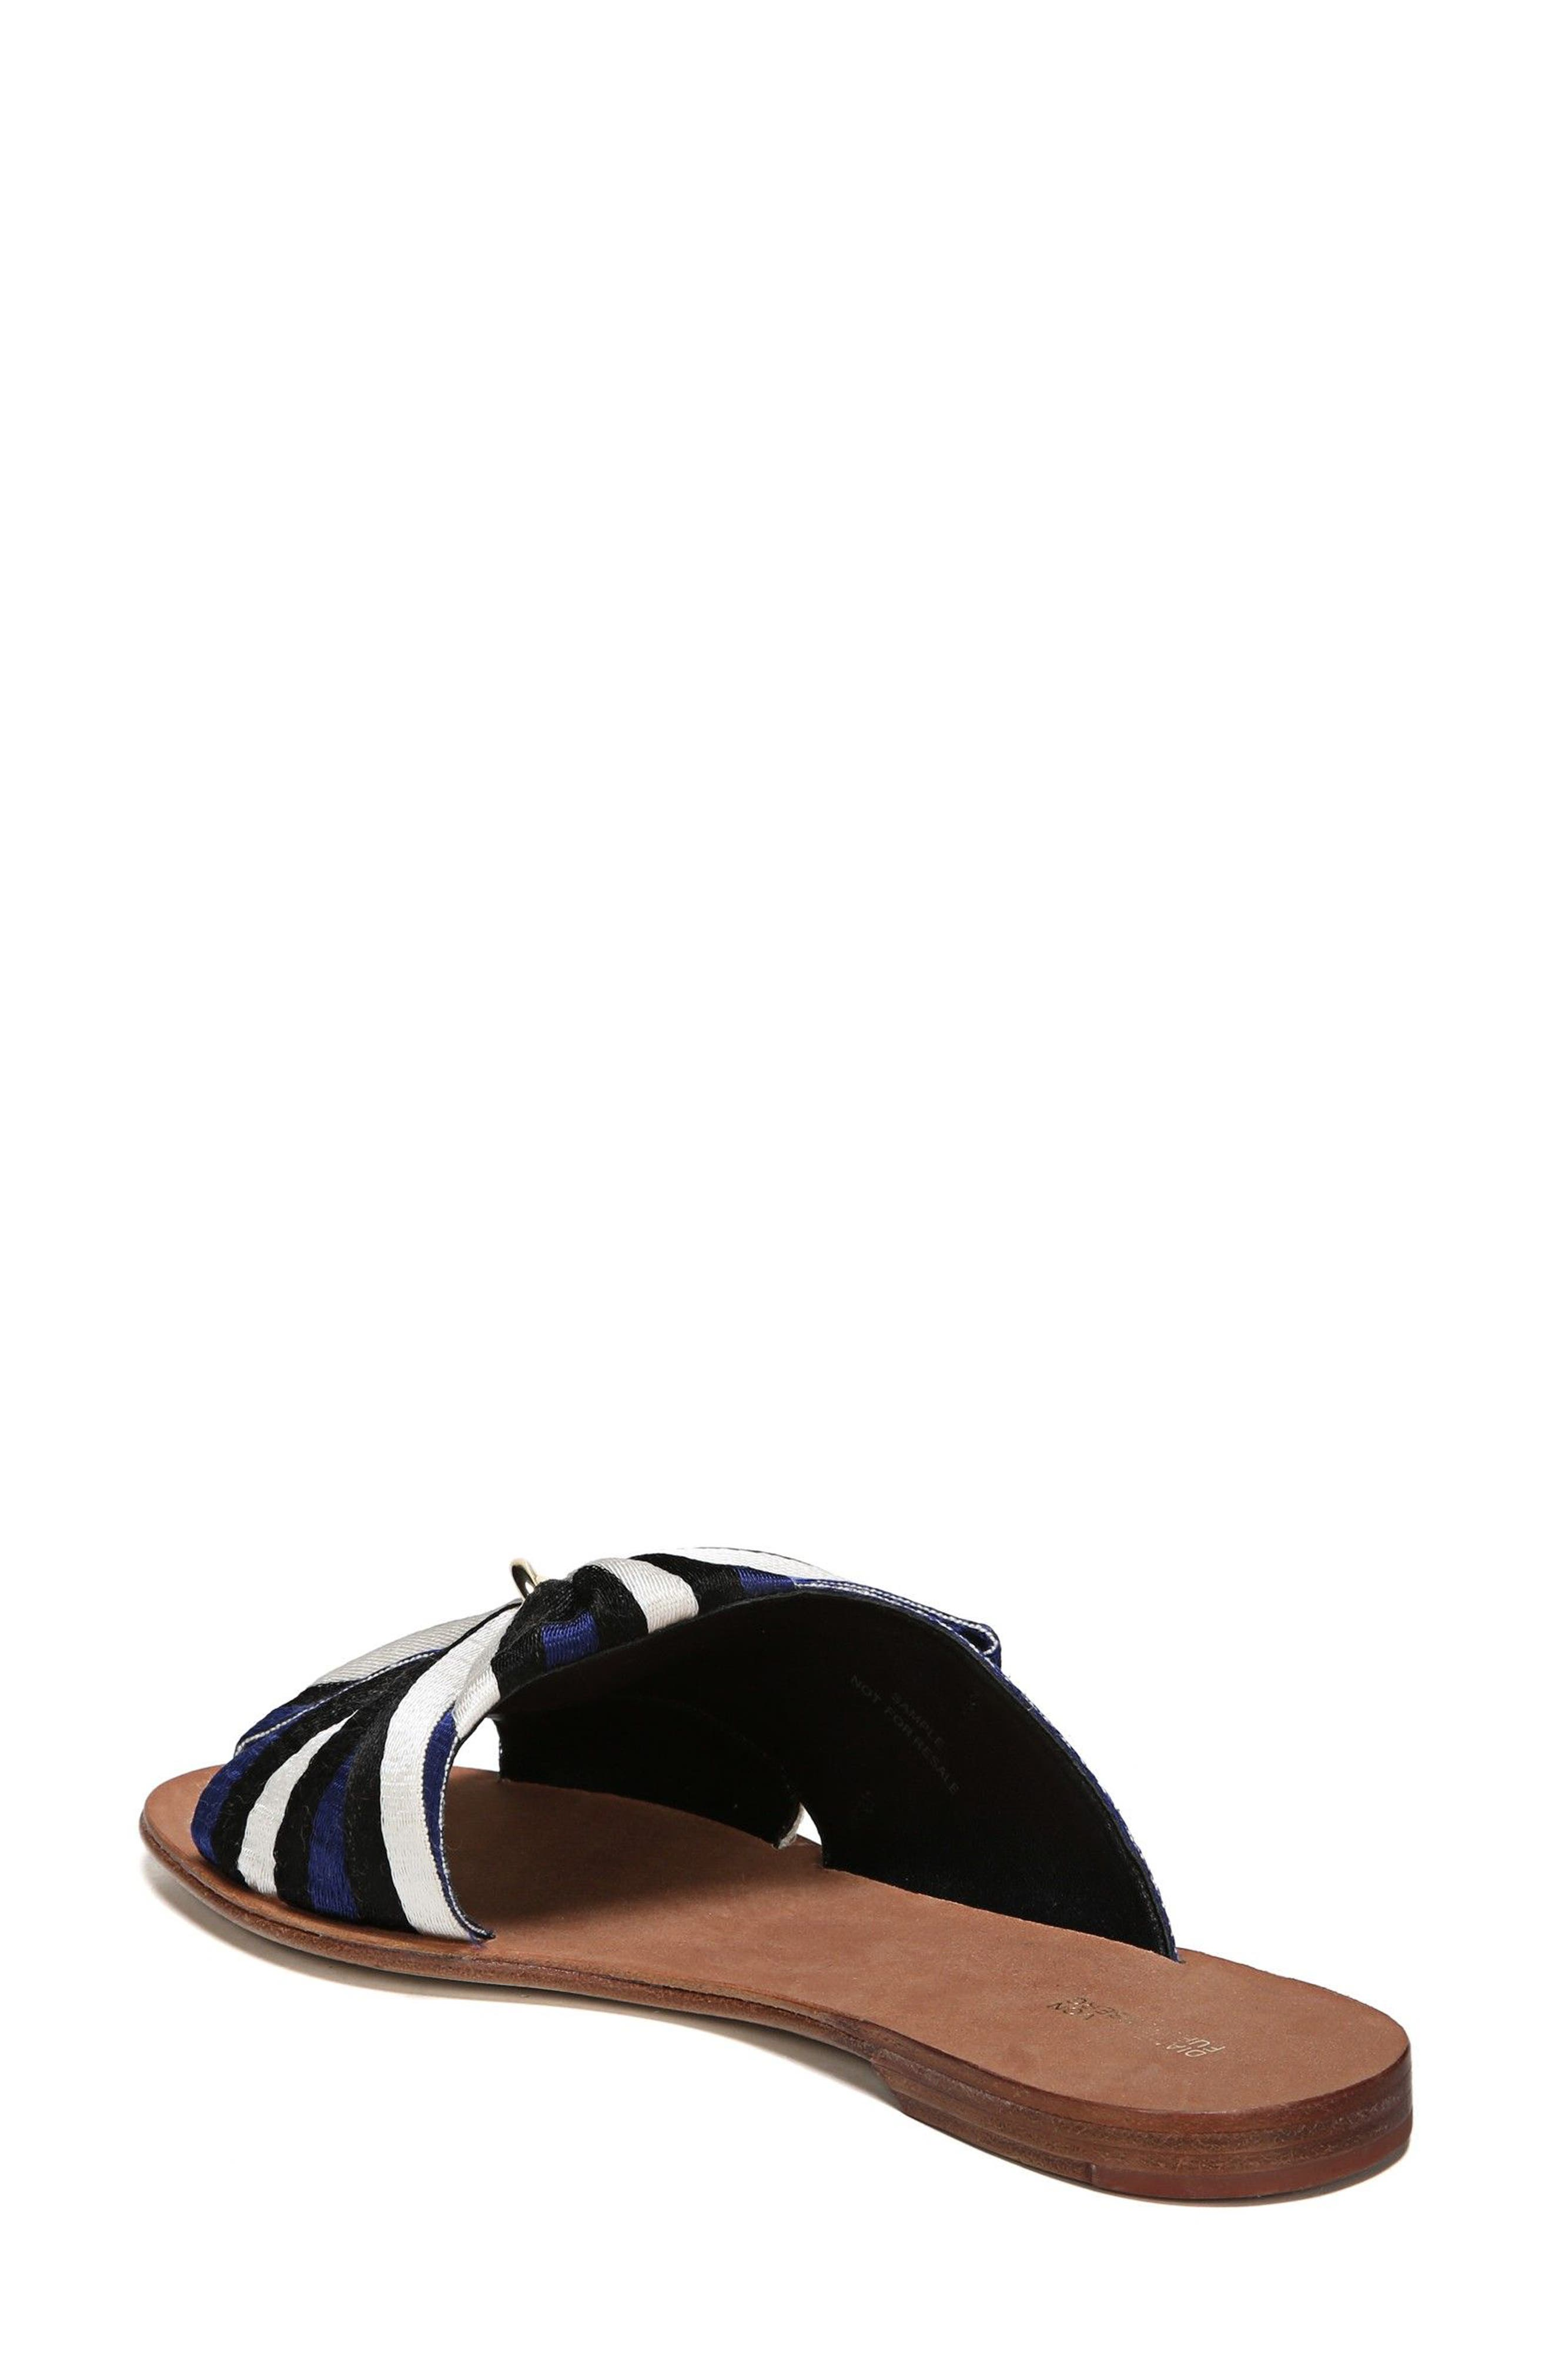 Bella Asymmetrical Slide Sandal,                             Alternate thumbnail 3, color,